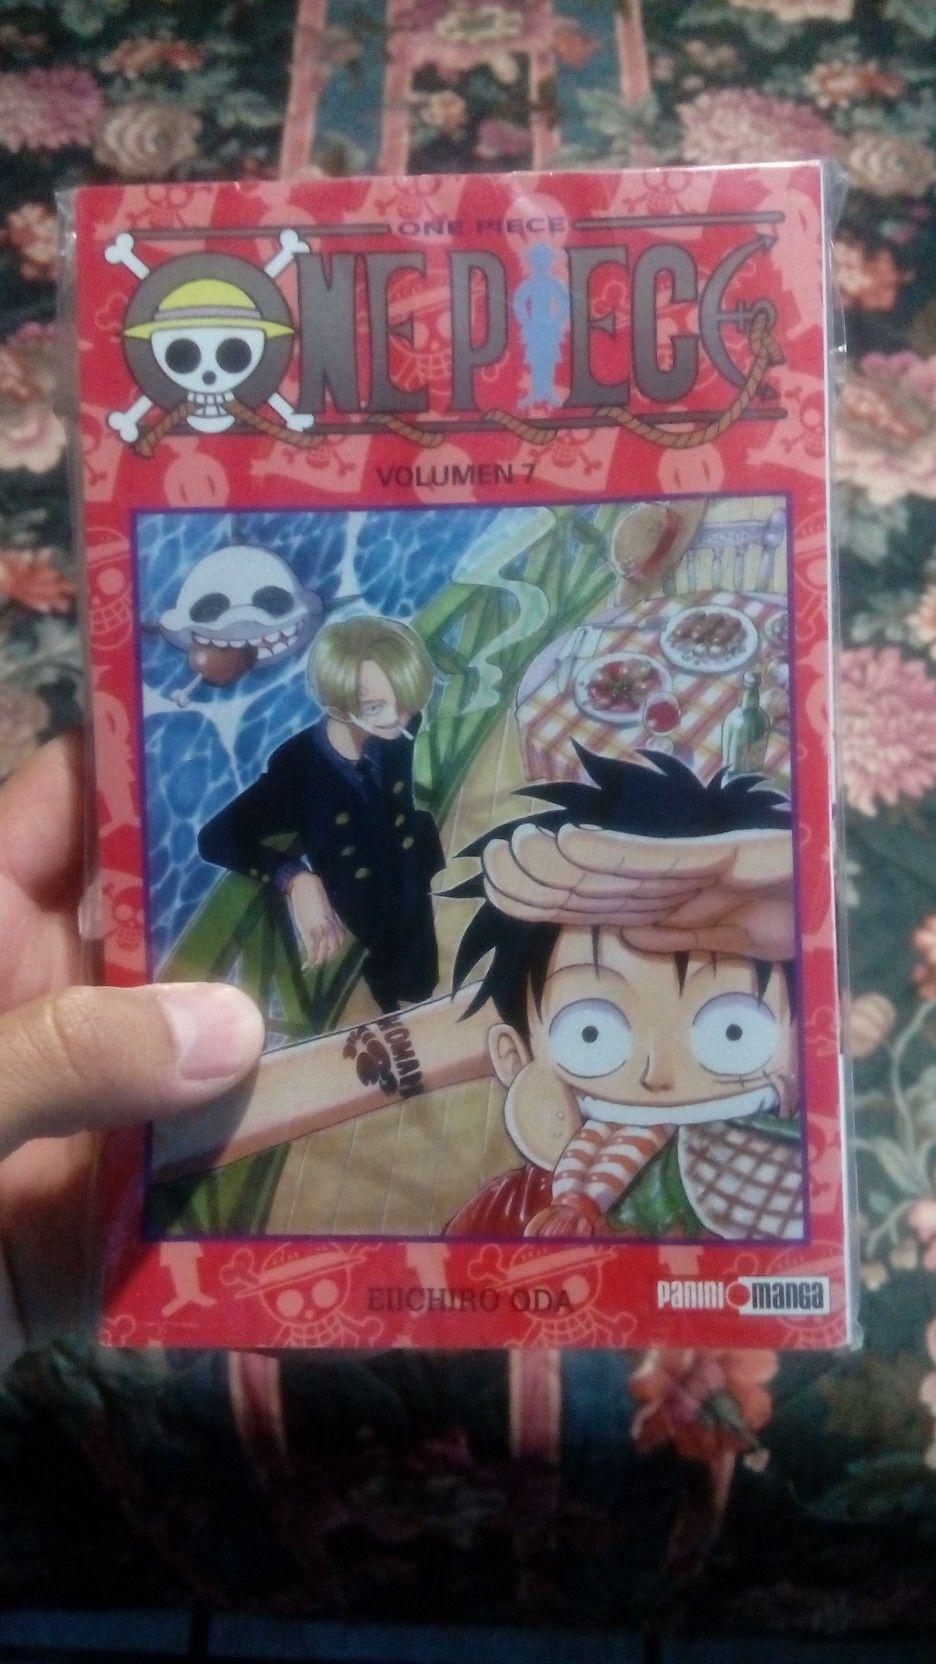 Manga volumen 7